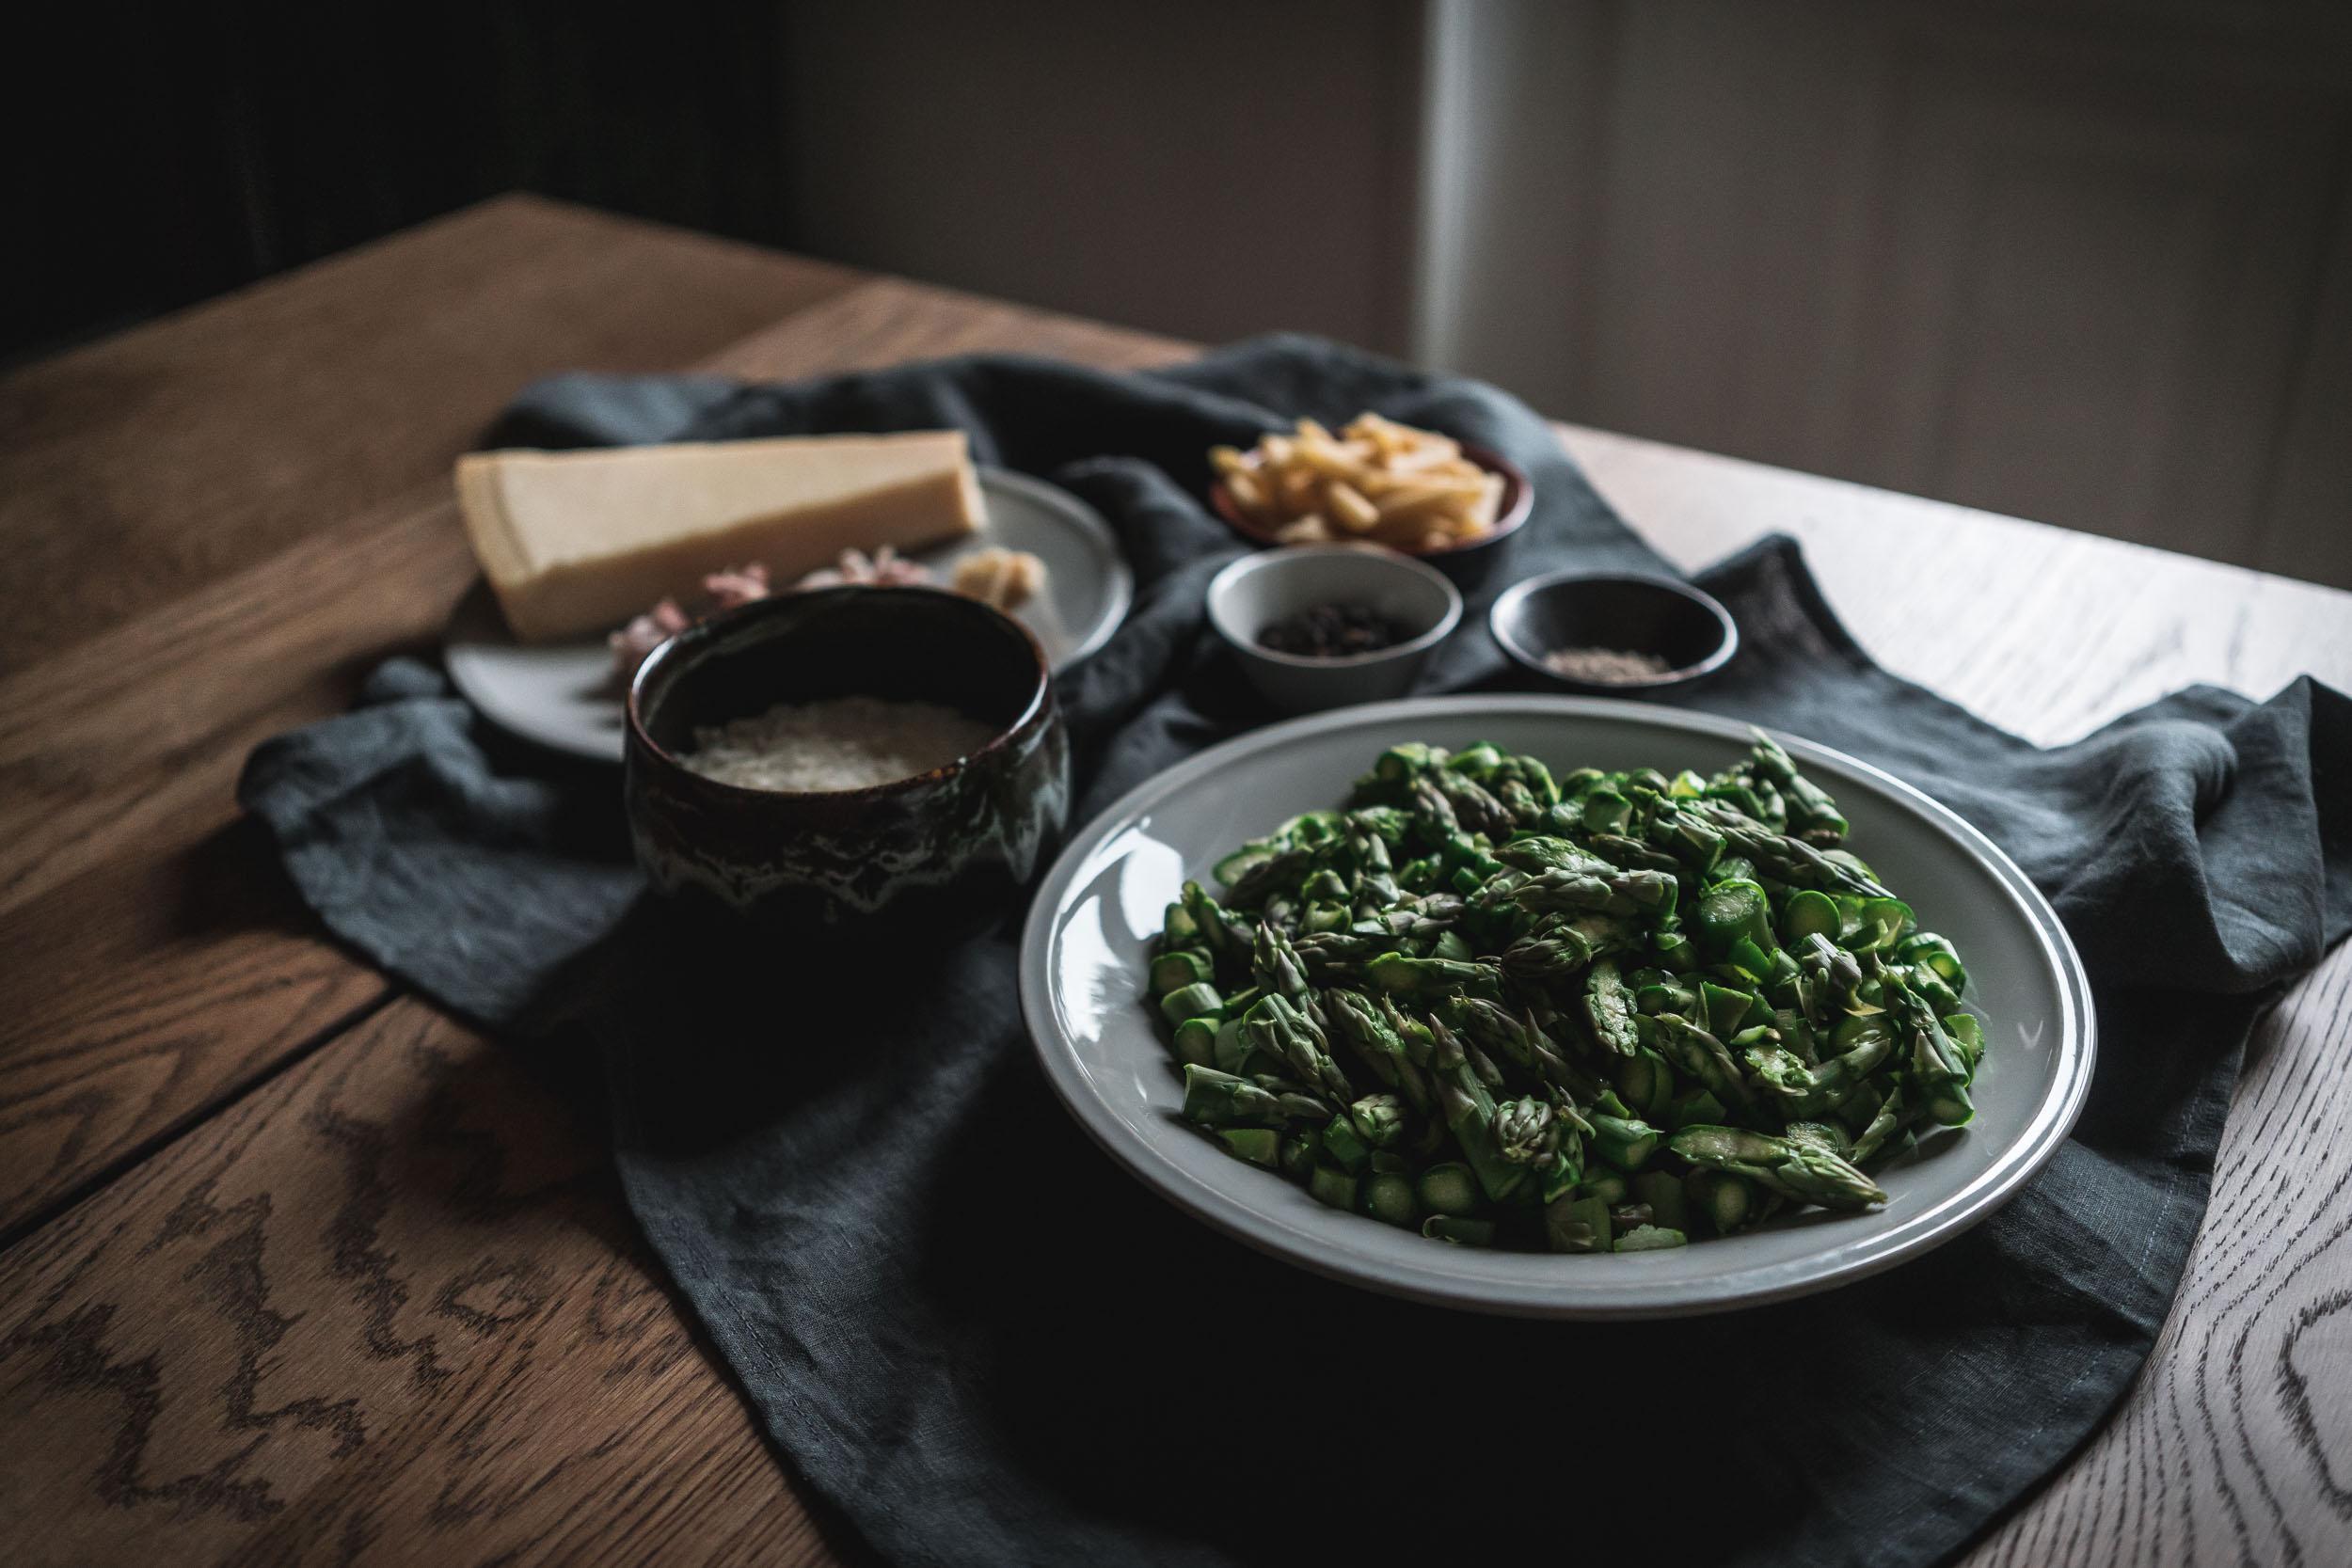 Asparagus-and-Bacon-Penne-Pasta-05114.jpg